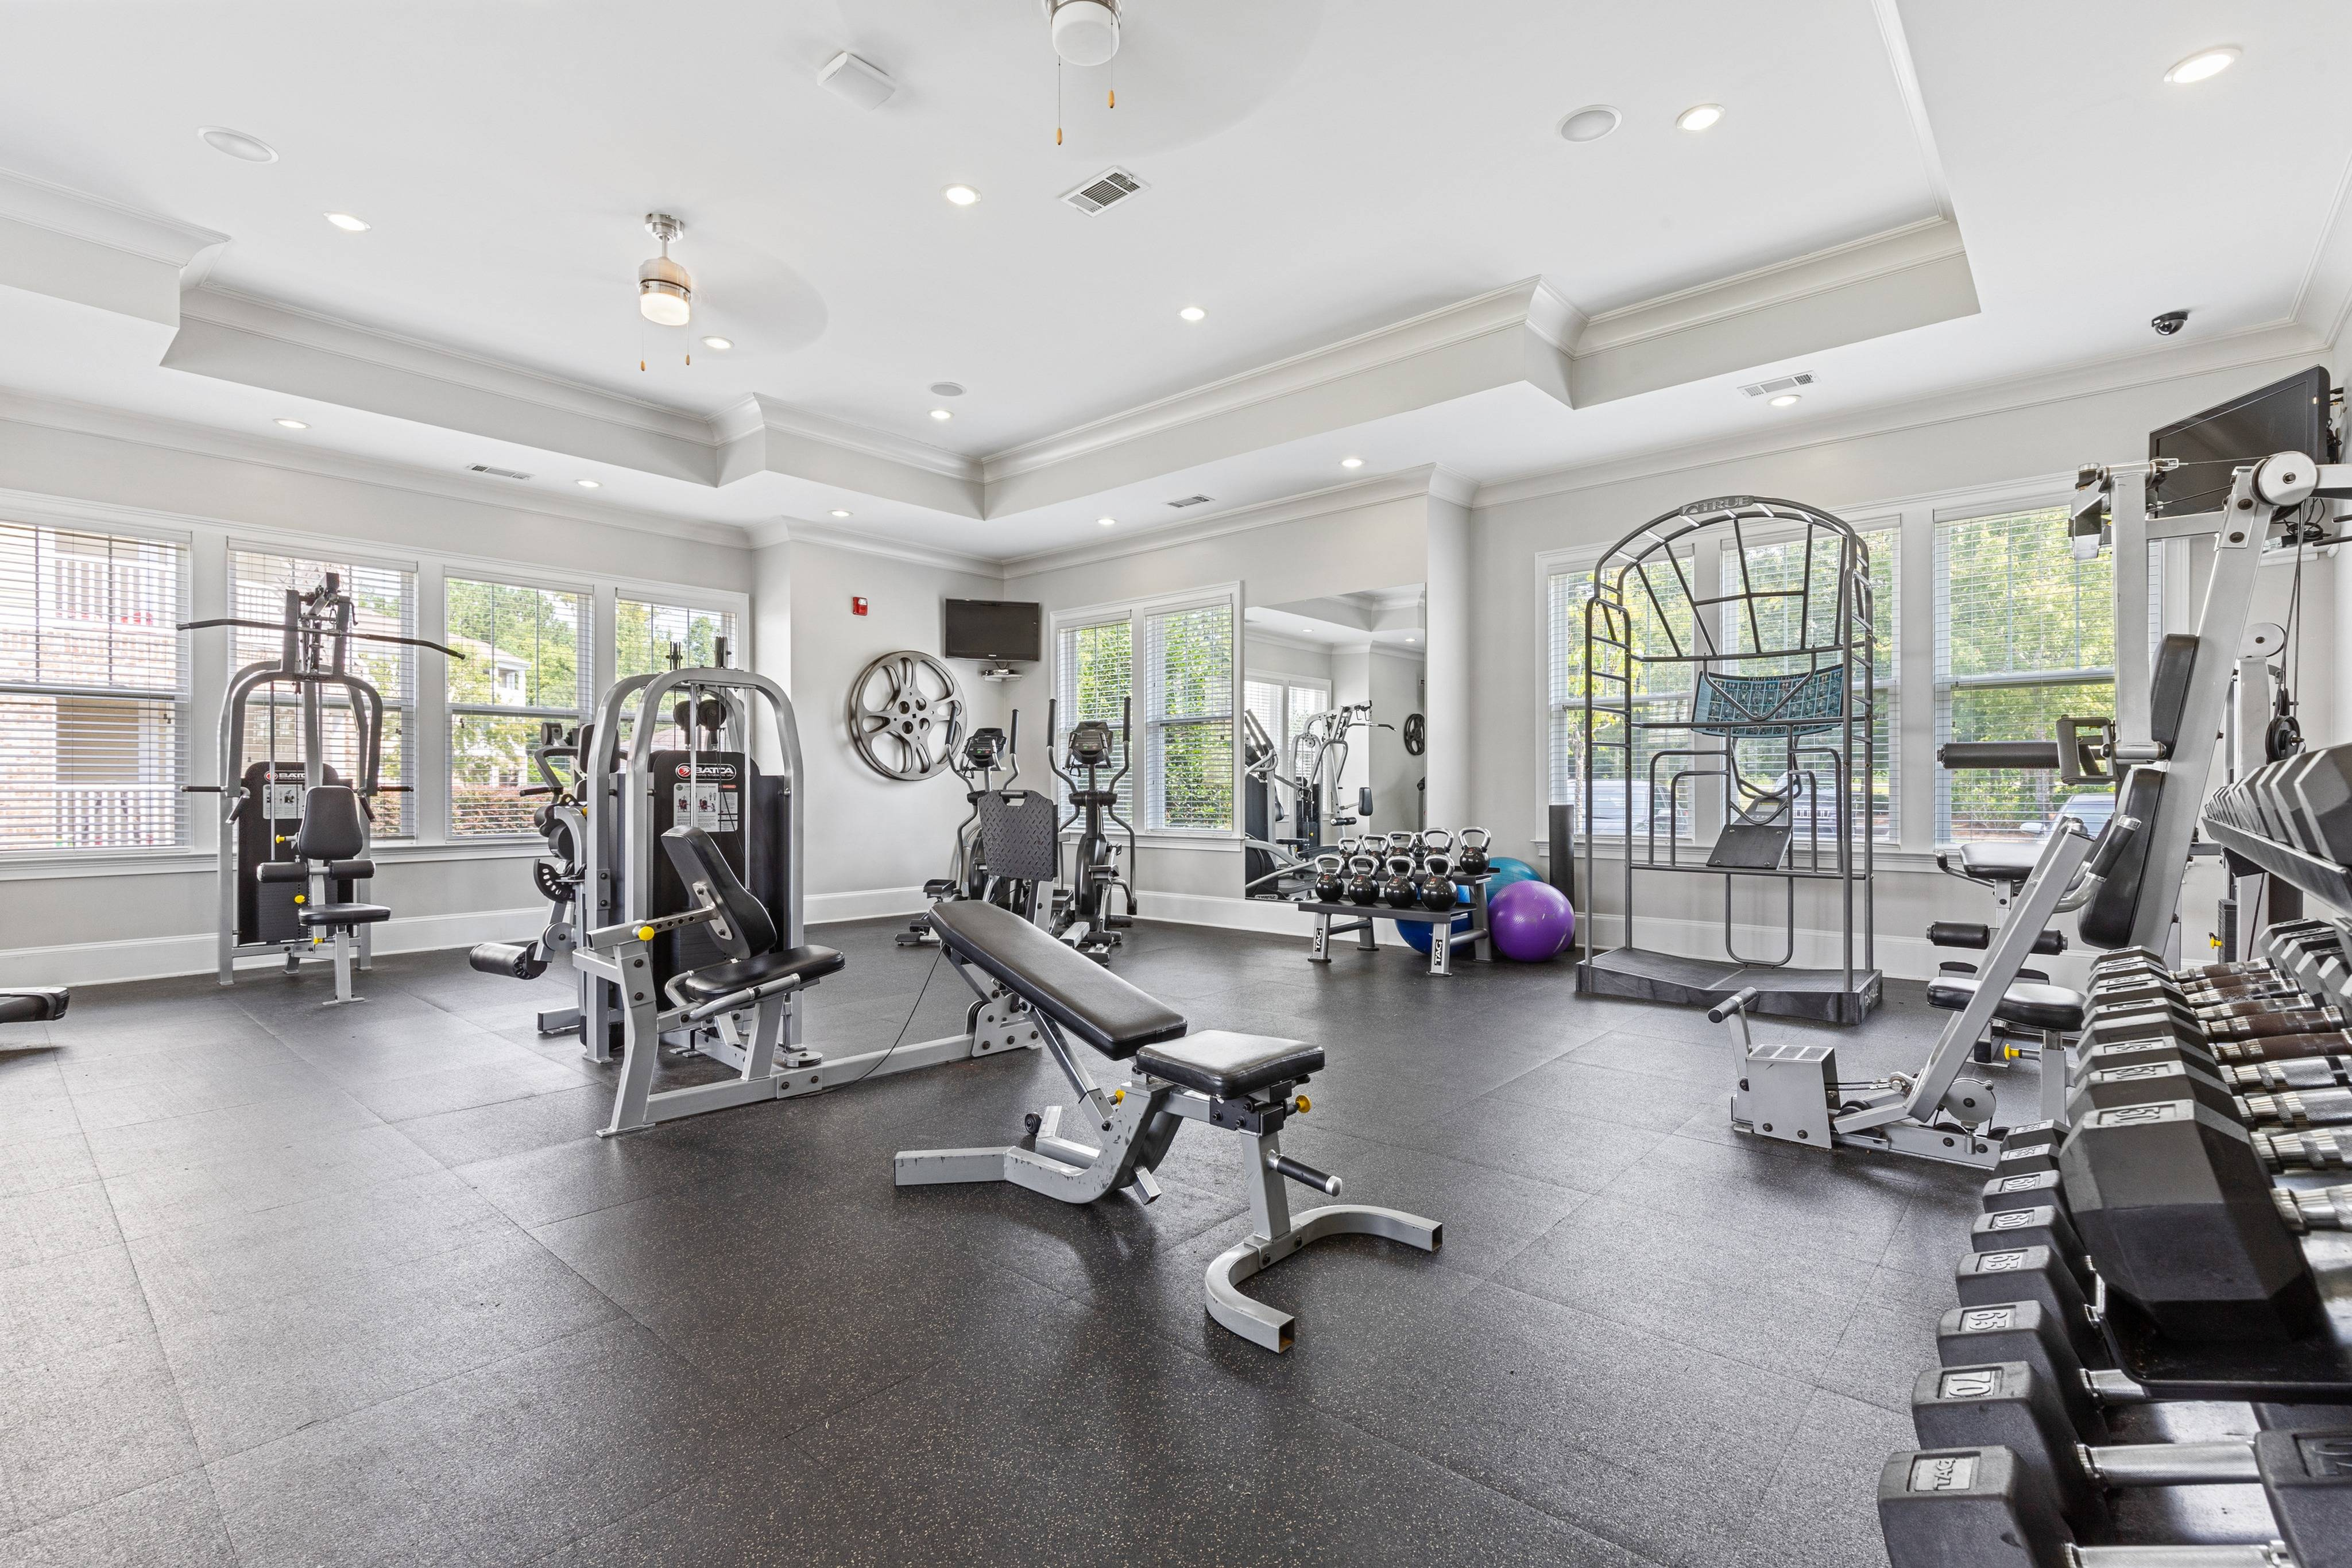 St. James at Goose Creek Fitness Center